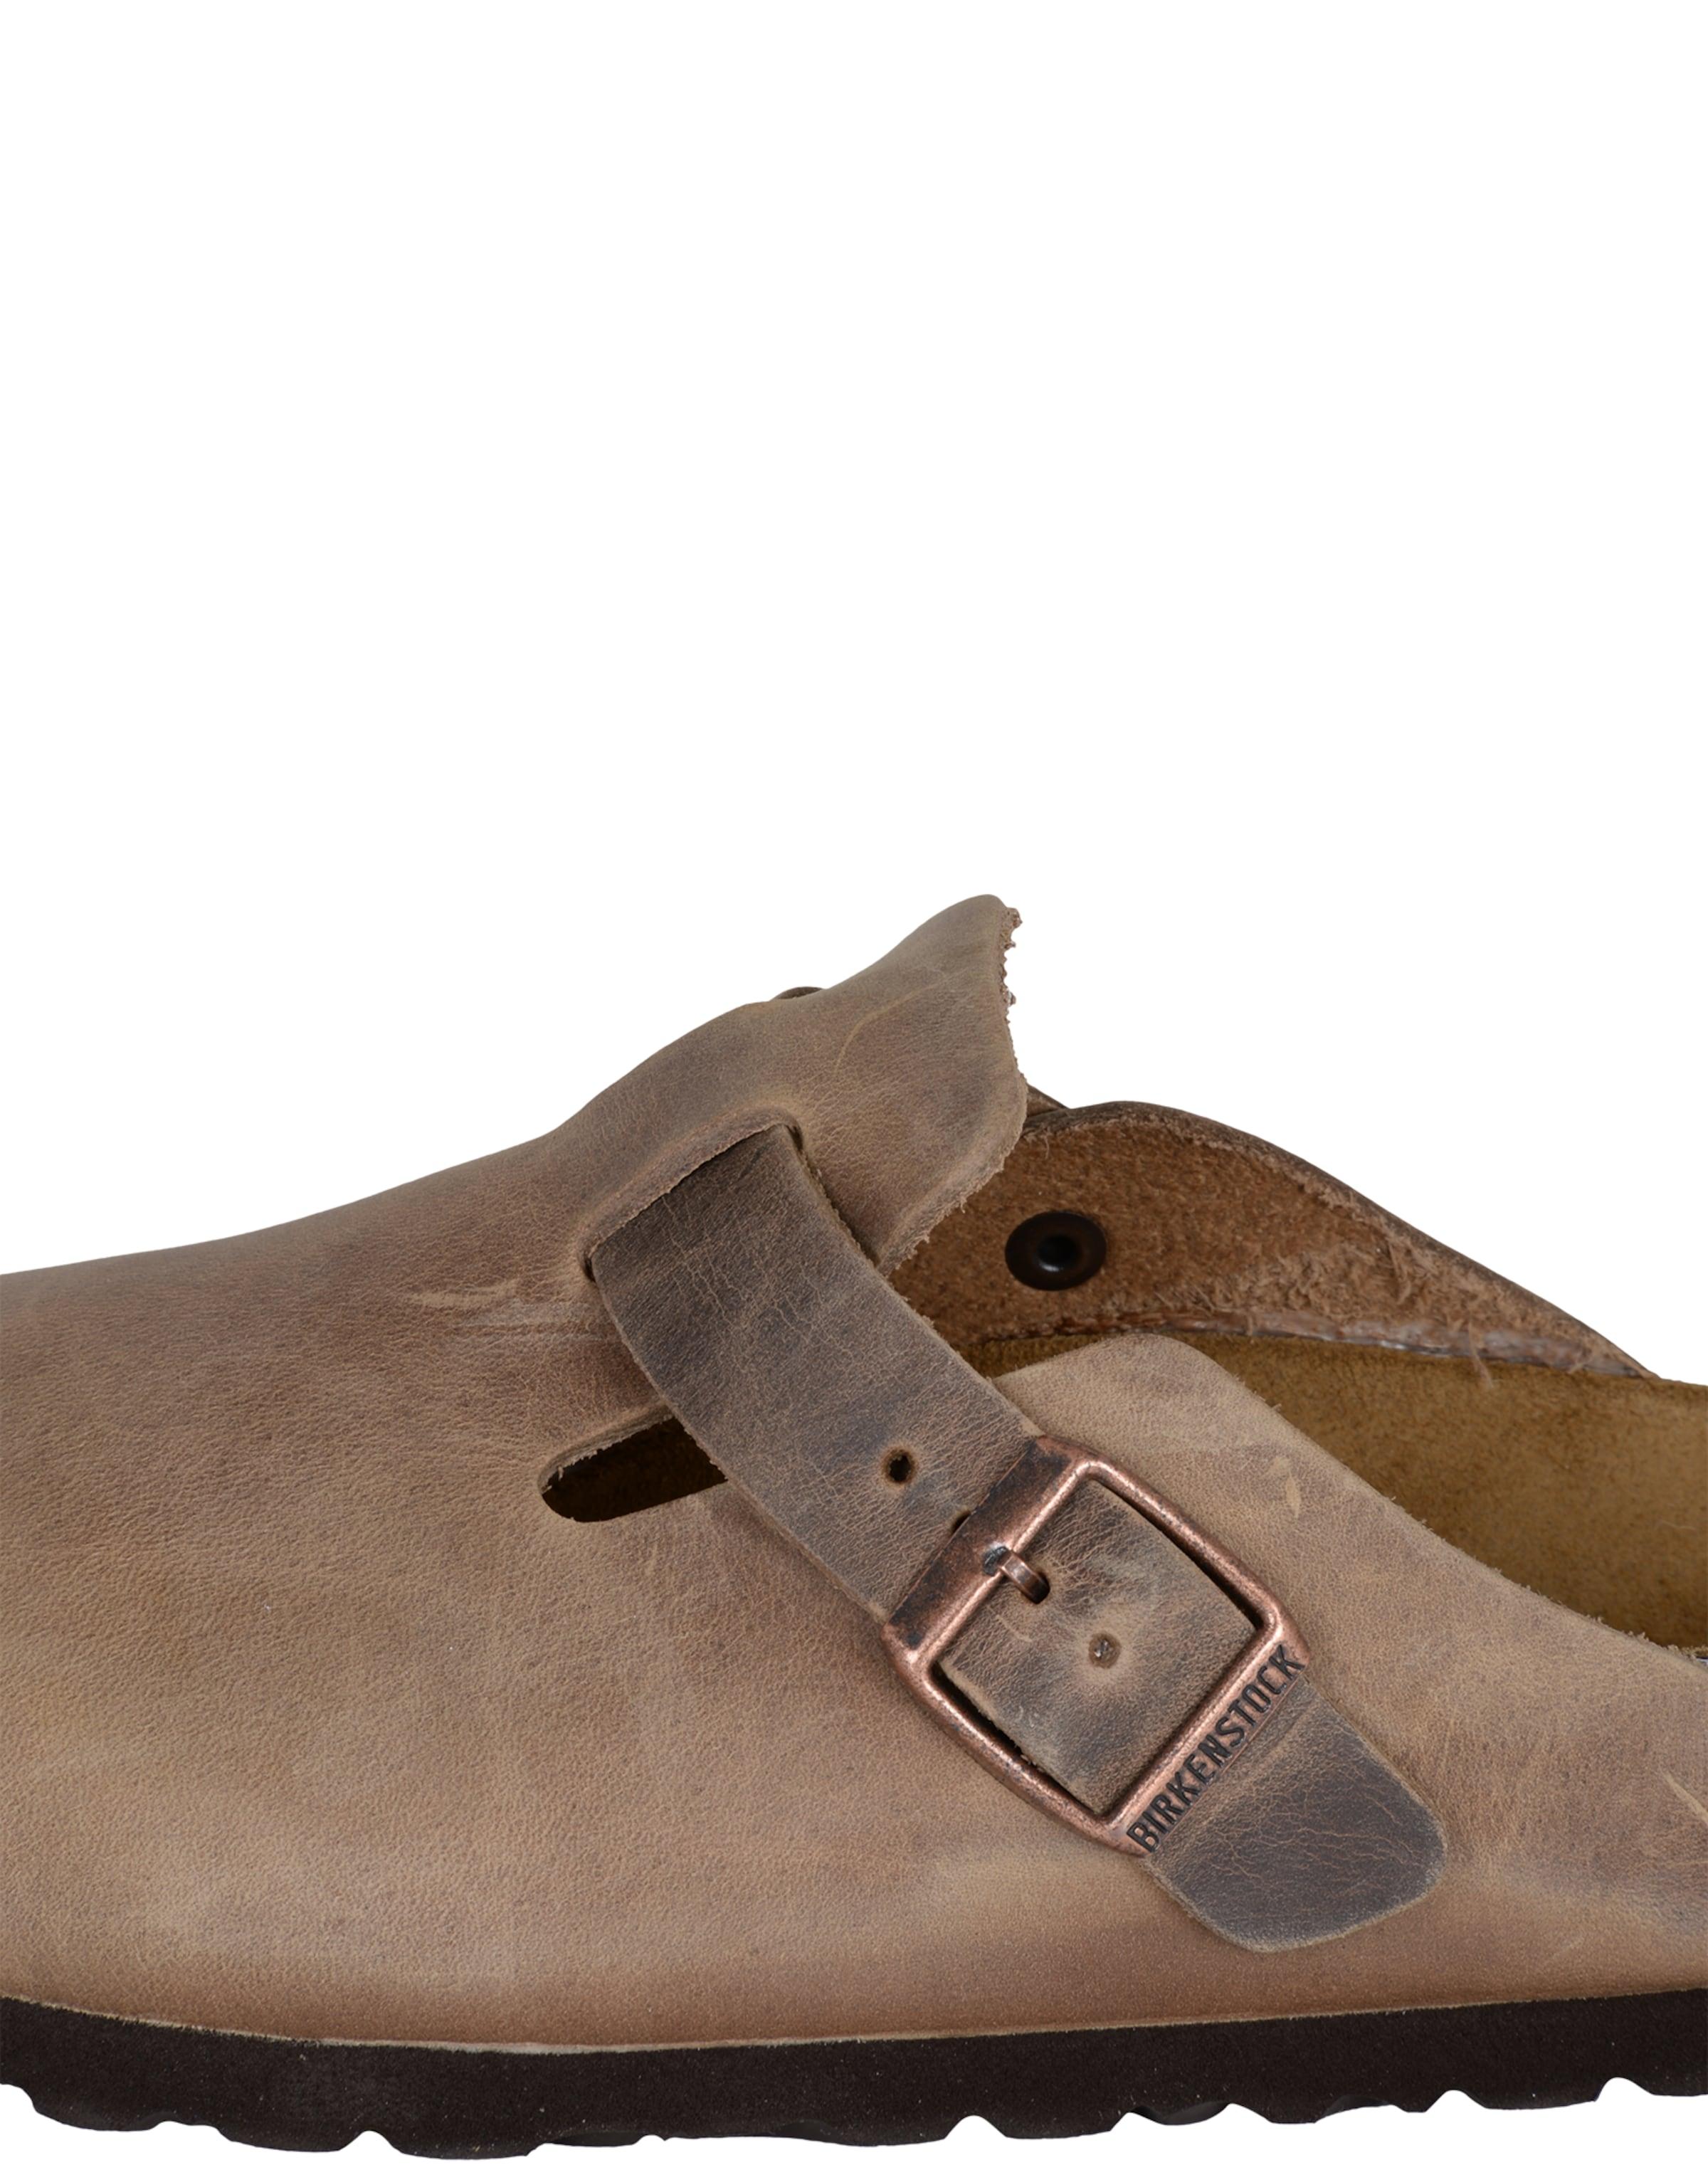 Clogs 'boston' Birkenstock Clogs Birkenstock In Braun 4ARc5q3jLS